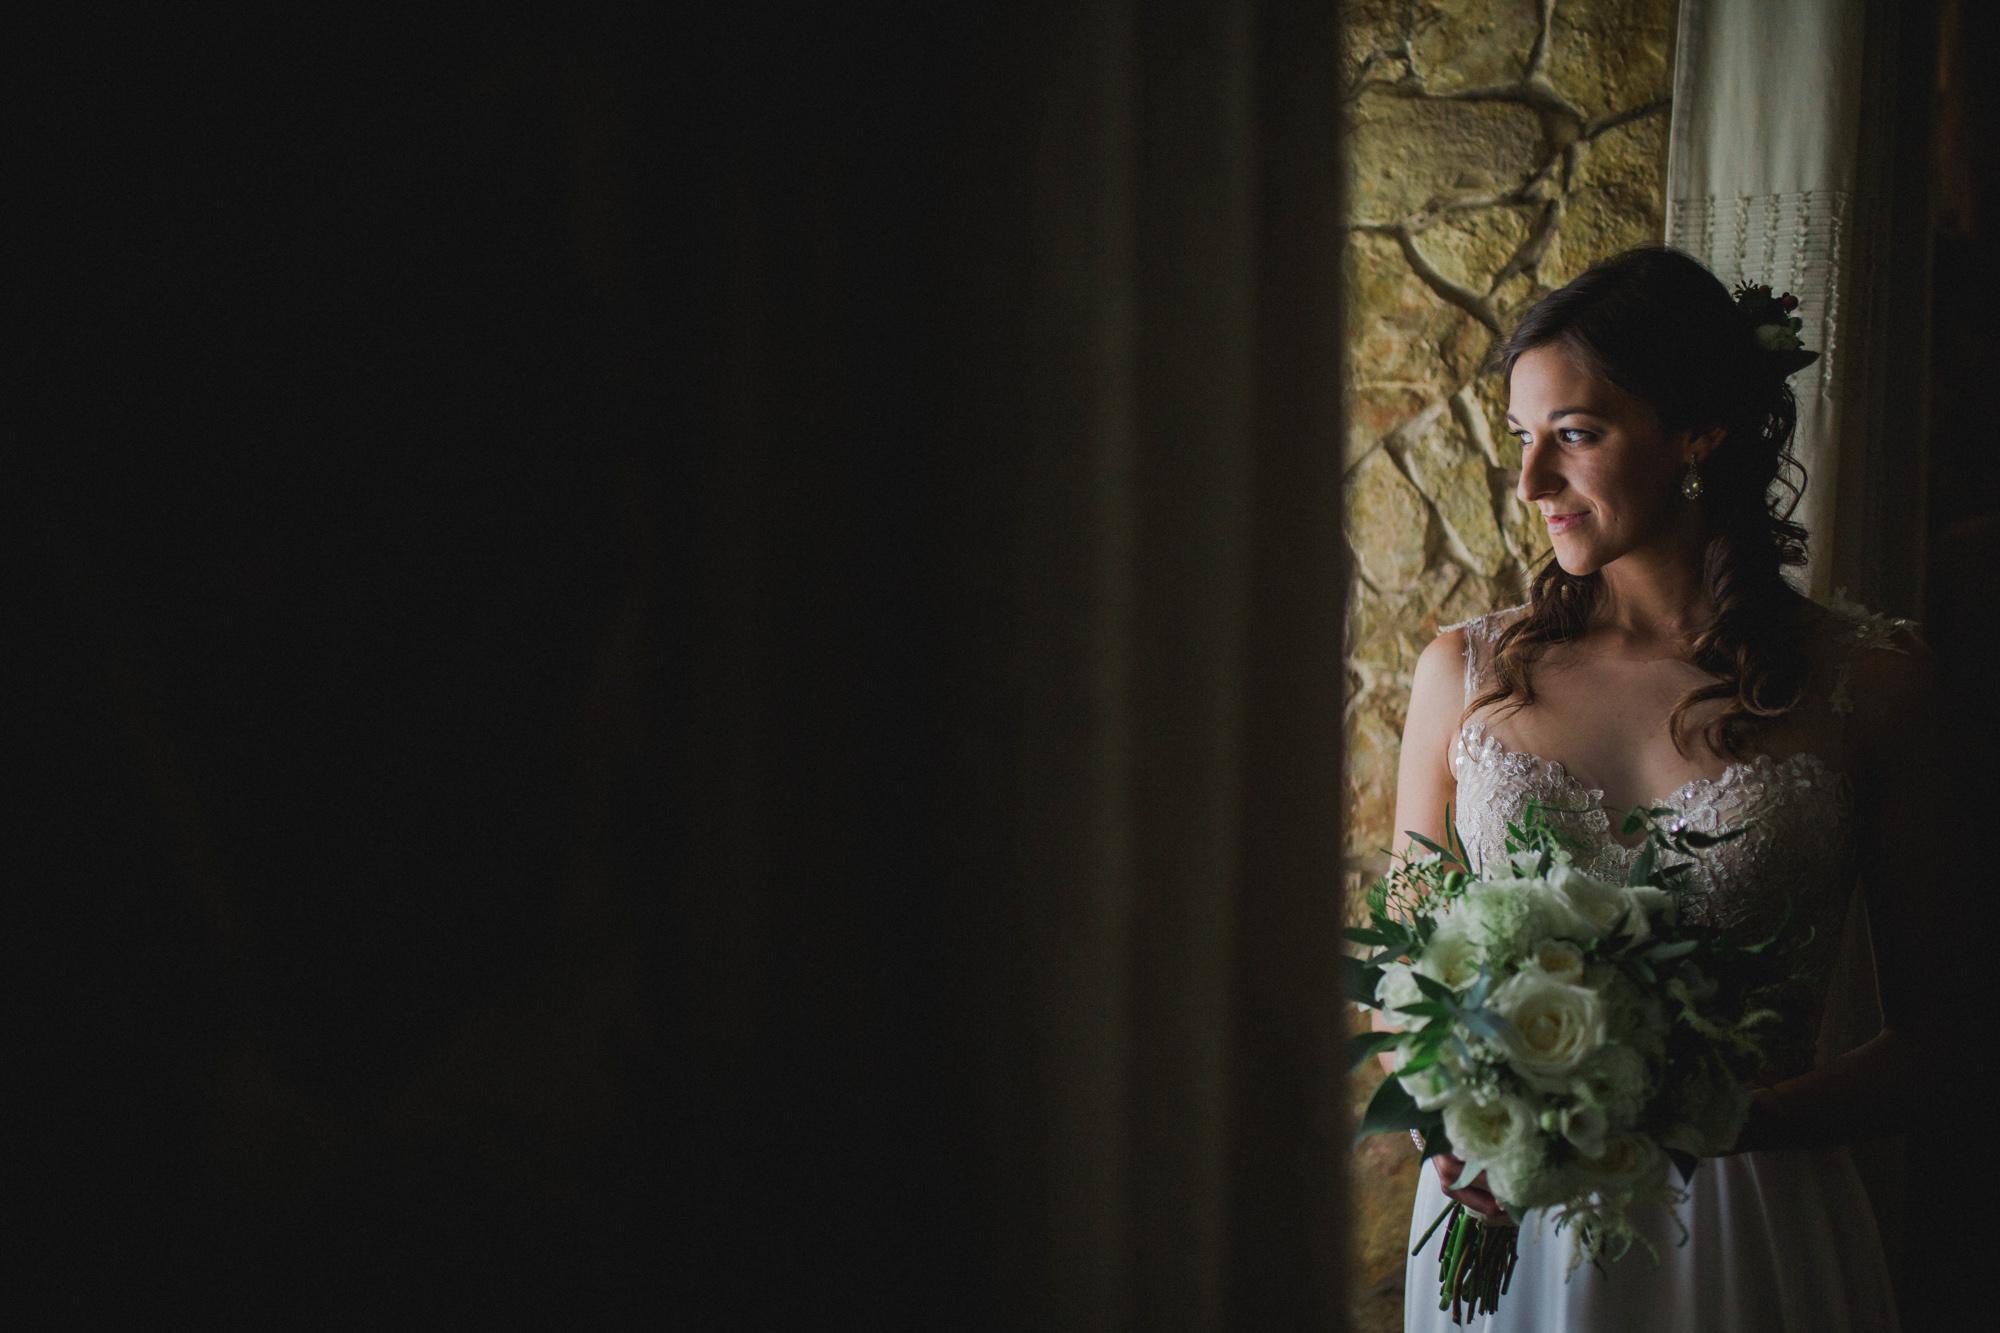 074-carina-e-samuel-wedding-casamento-quinta-dos-rouxinois-rustico-my-fancy-wedding-mafra-malveira-lisboa-sintra-cascais-filipe-santiago-fotografia-fotografo-lifestyle-destination-portugal